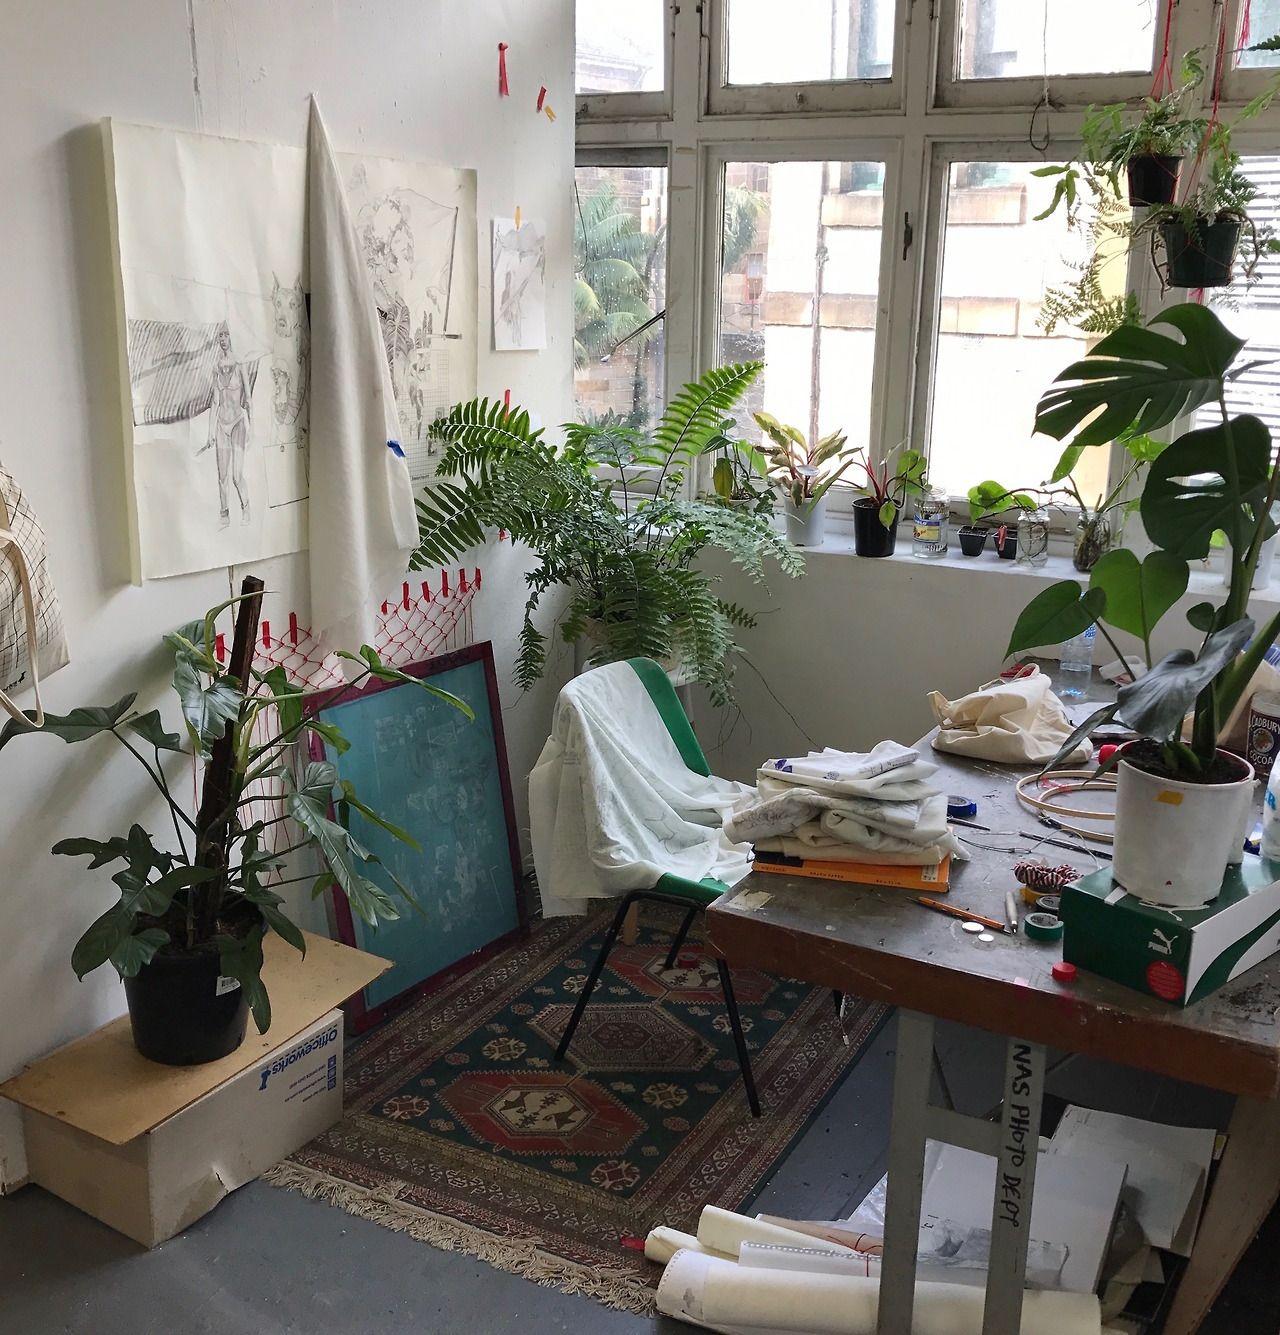 Aesthetic Apartment: Fresh Studio Atelier Plants Art Work Living Space Interior